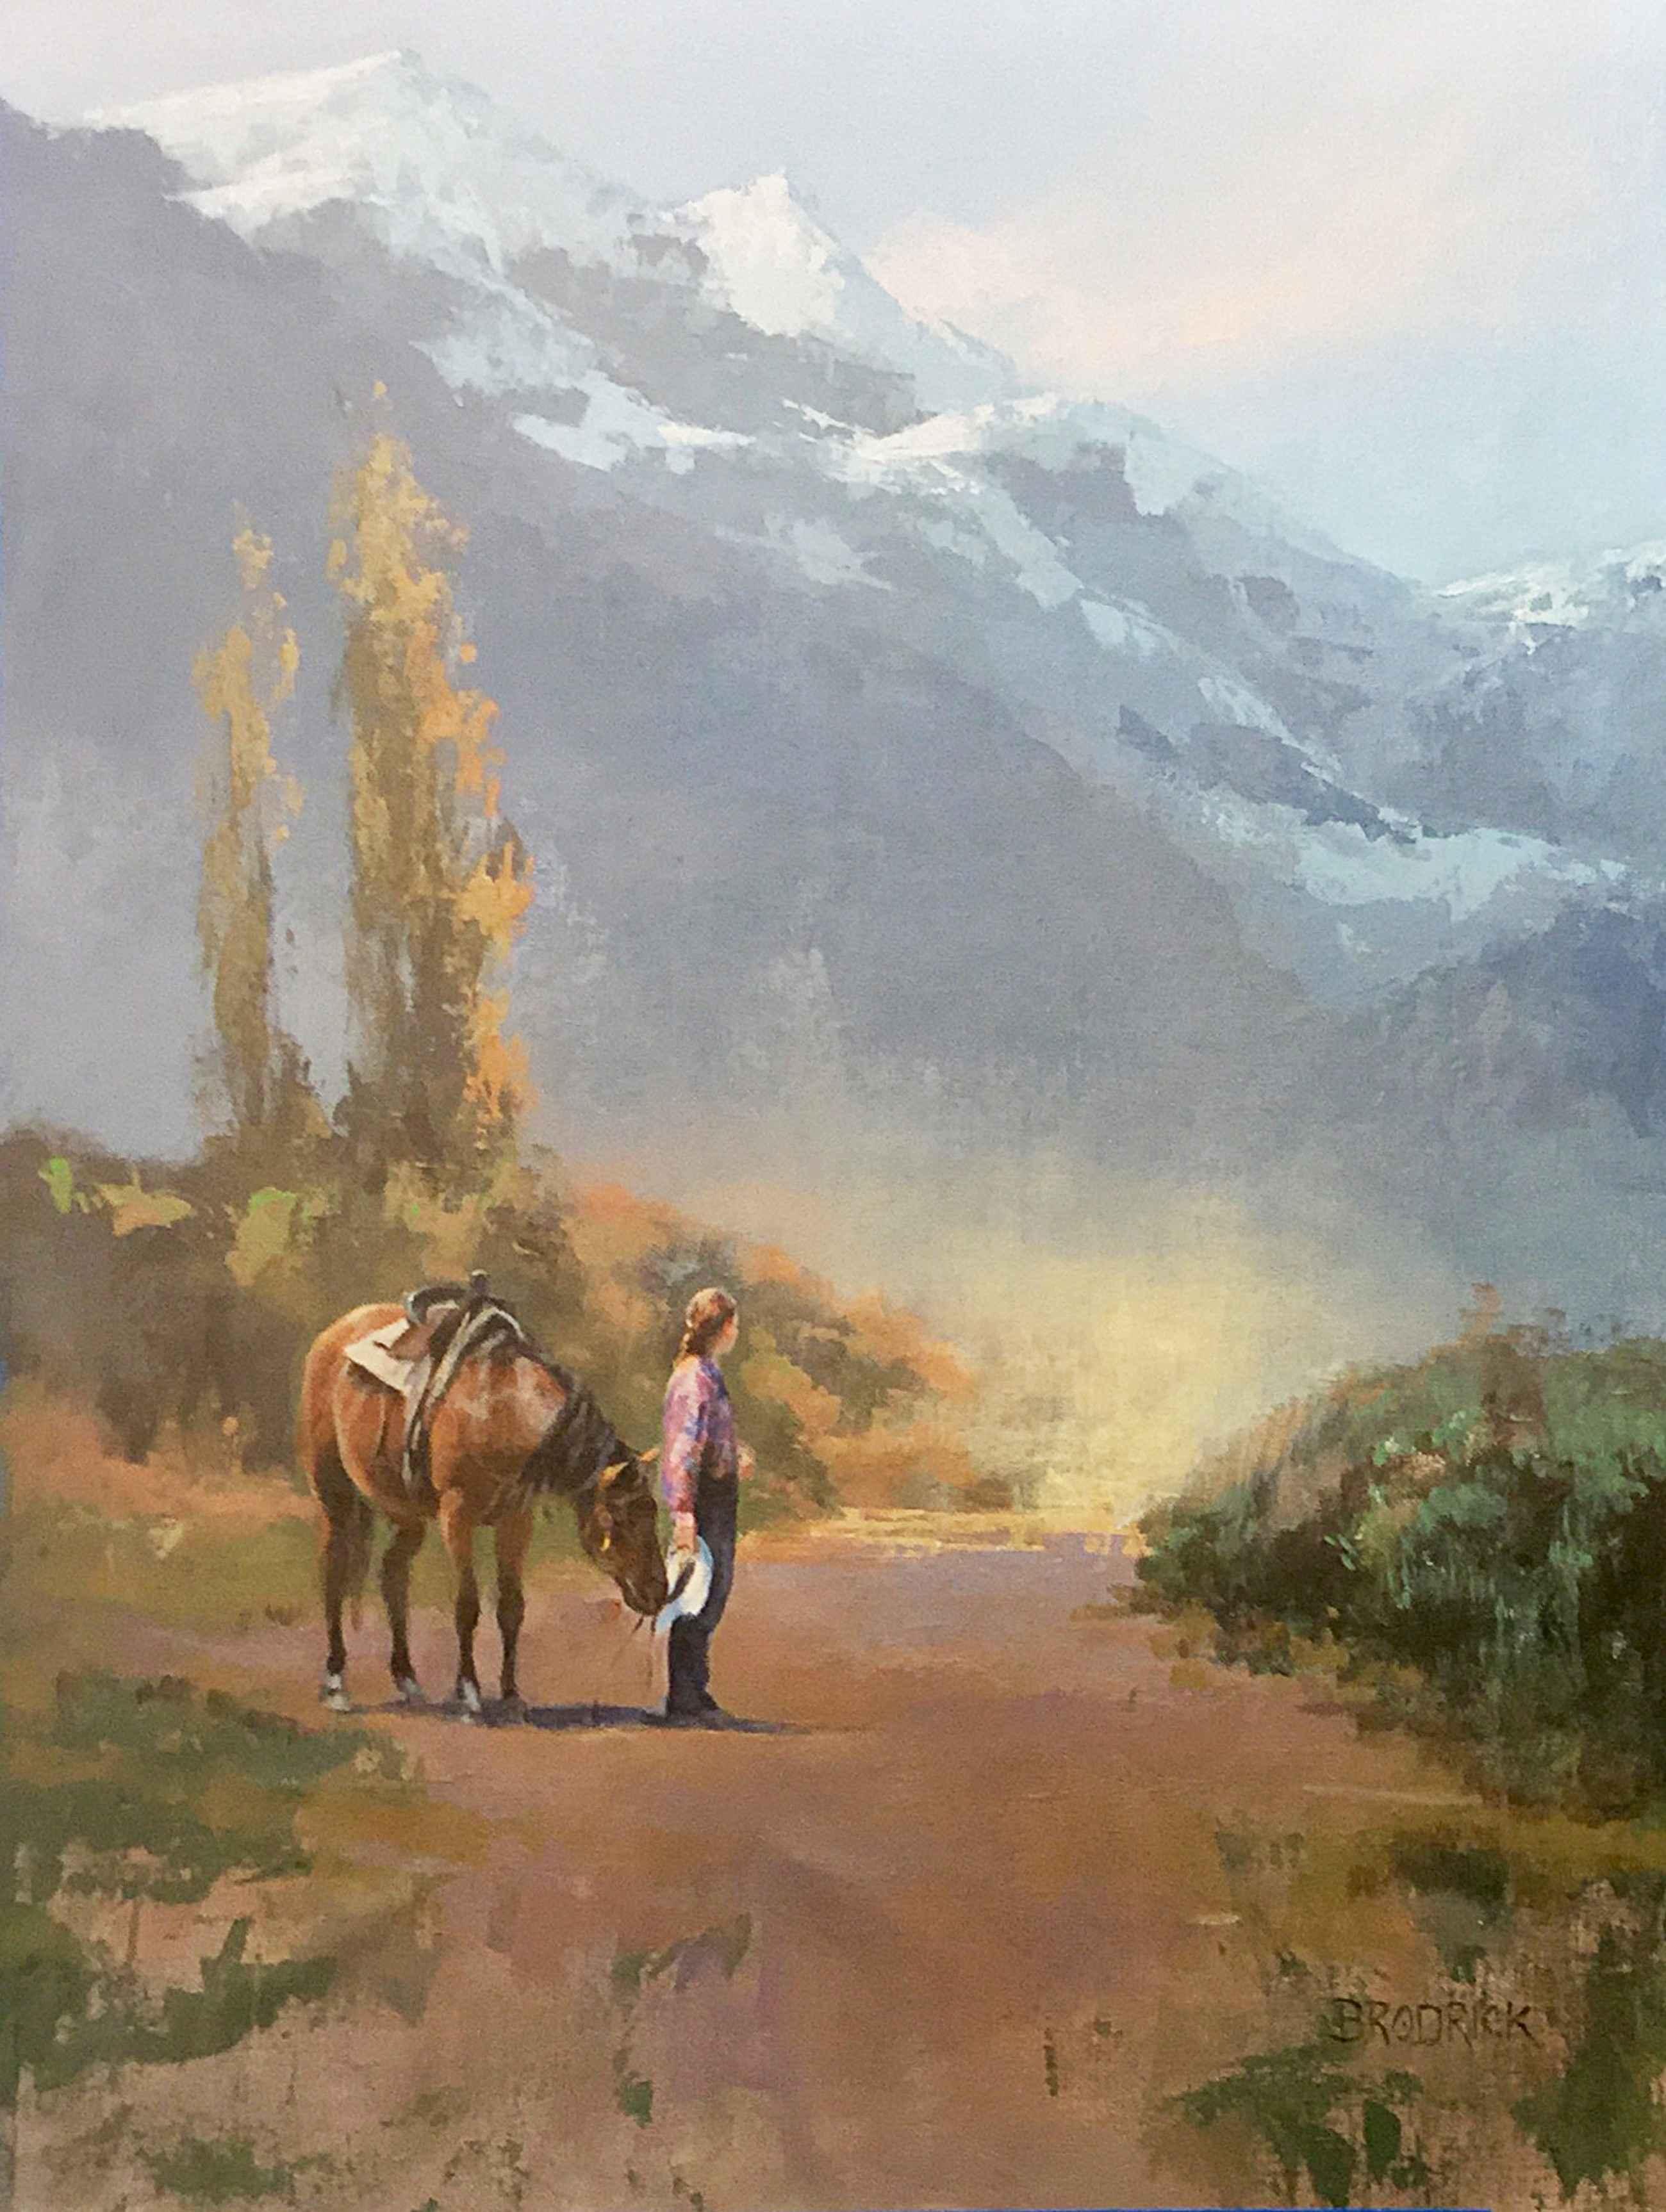 Waiting For Jenny by  JM Brodrick - Masterpiece Online